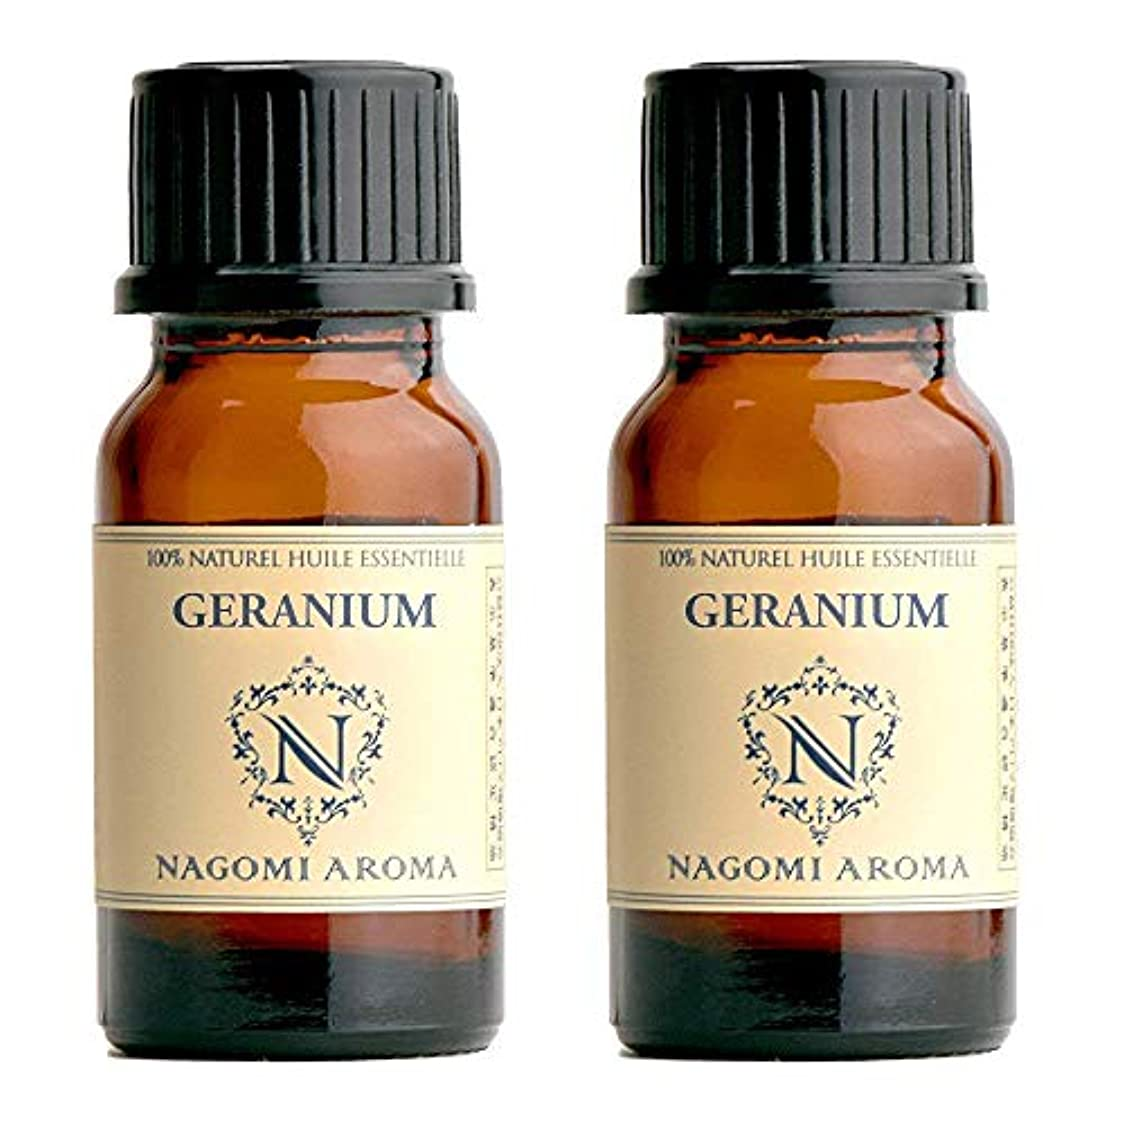 NAGOMI AROMA ゼラニウム 10ml 【AEAJ認定精油】【アロマオイル】 2個セット